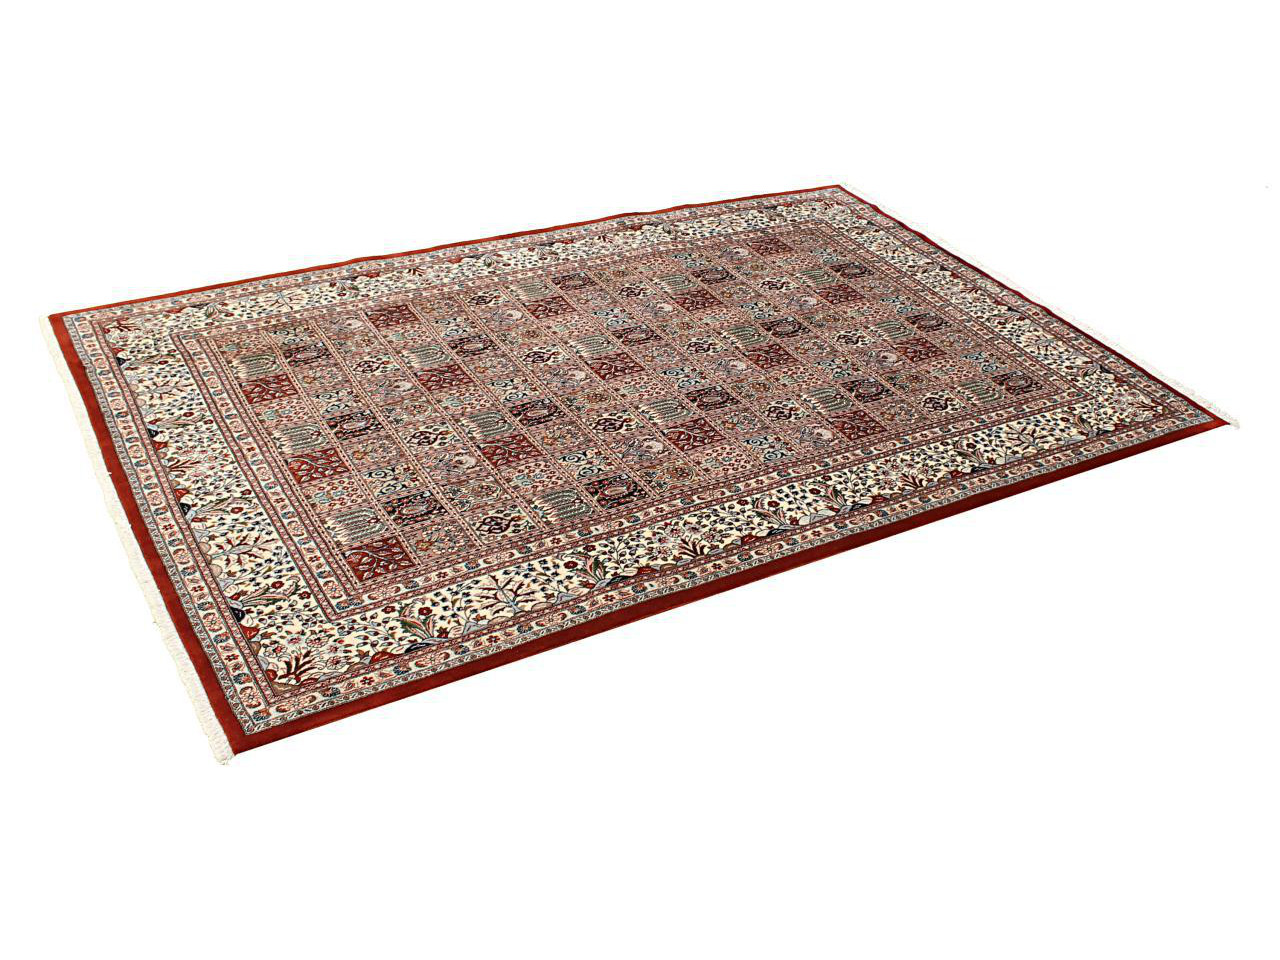 moud jardin sherkat tapis persans n 25517 297x200cm. Black Bedroom Furniture Sets. Home Design Ideas